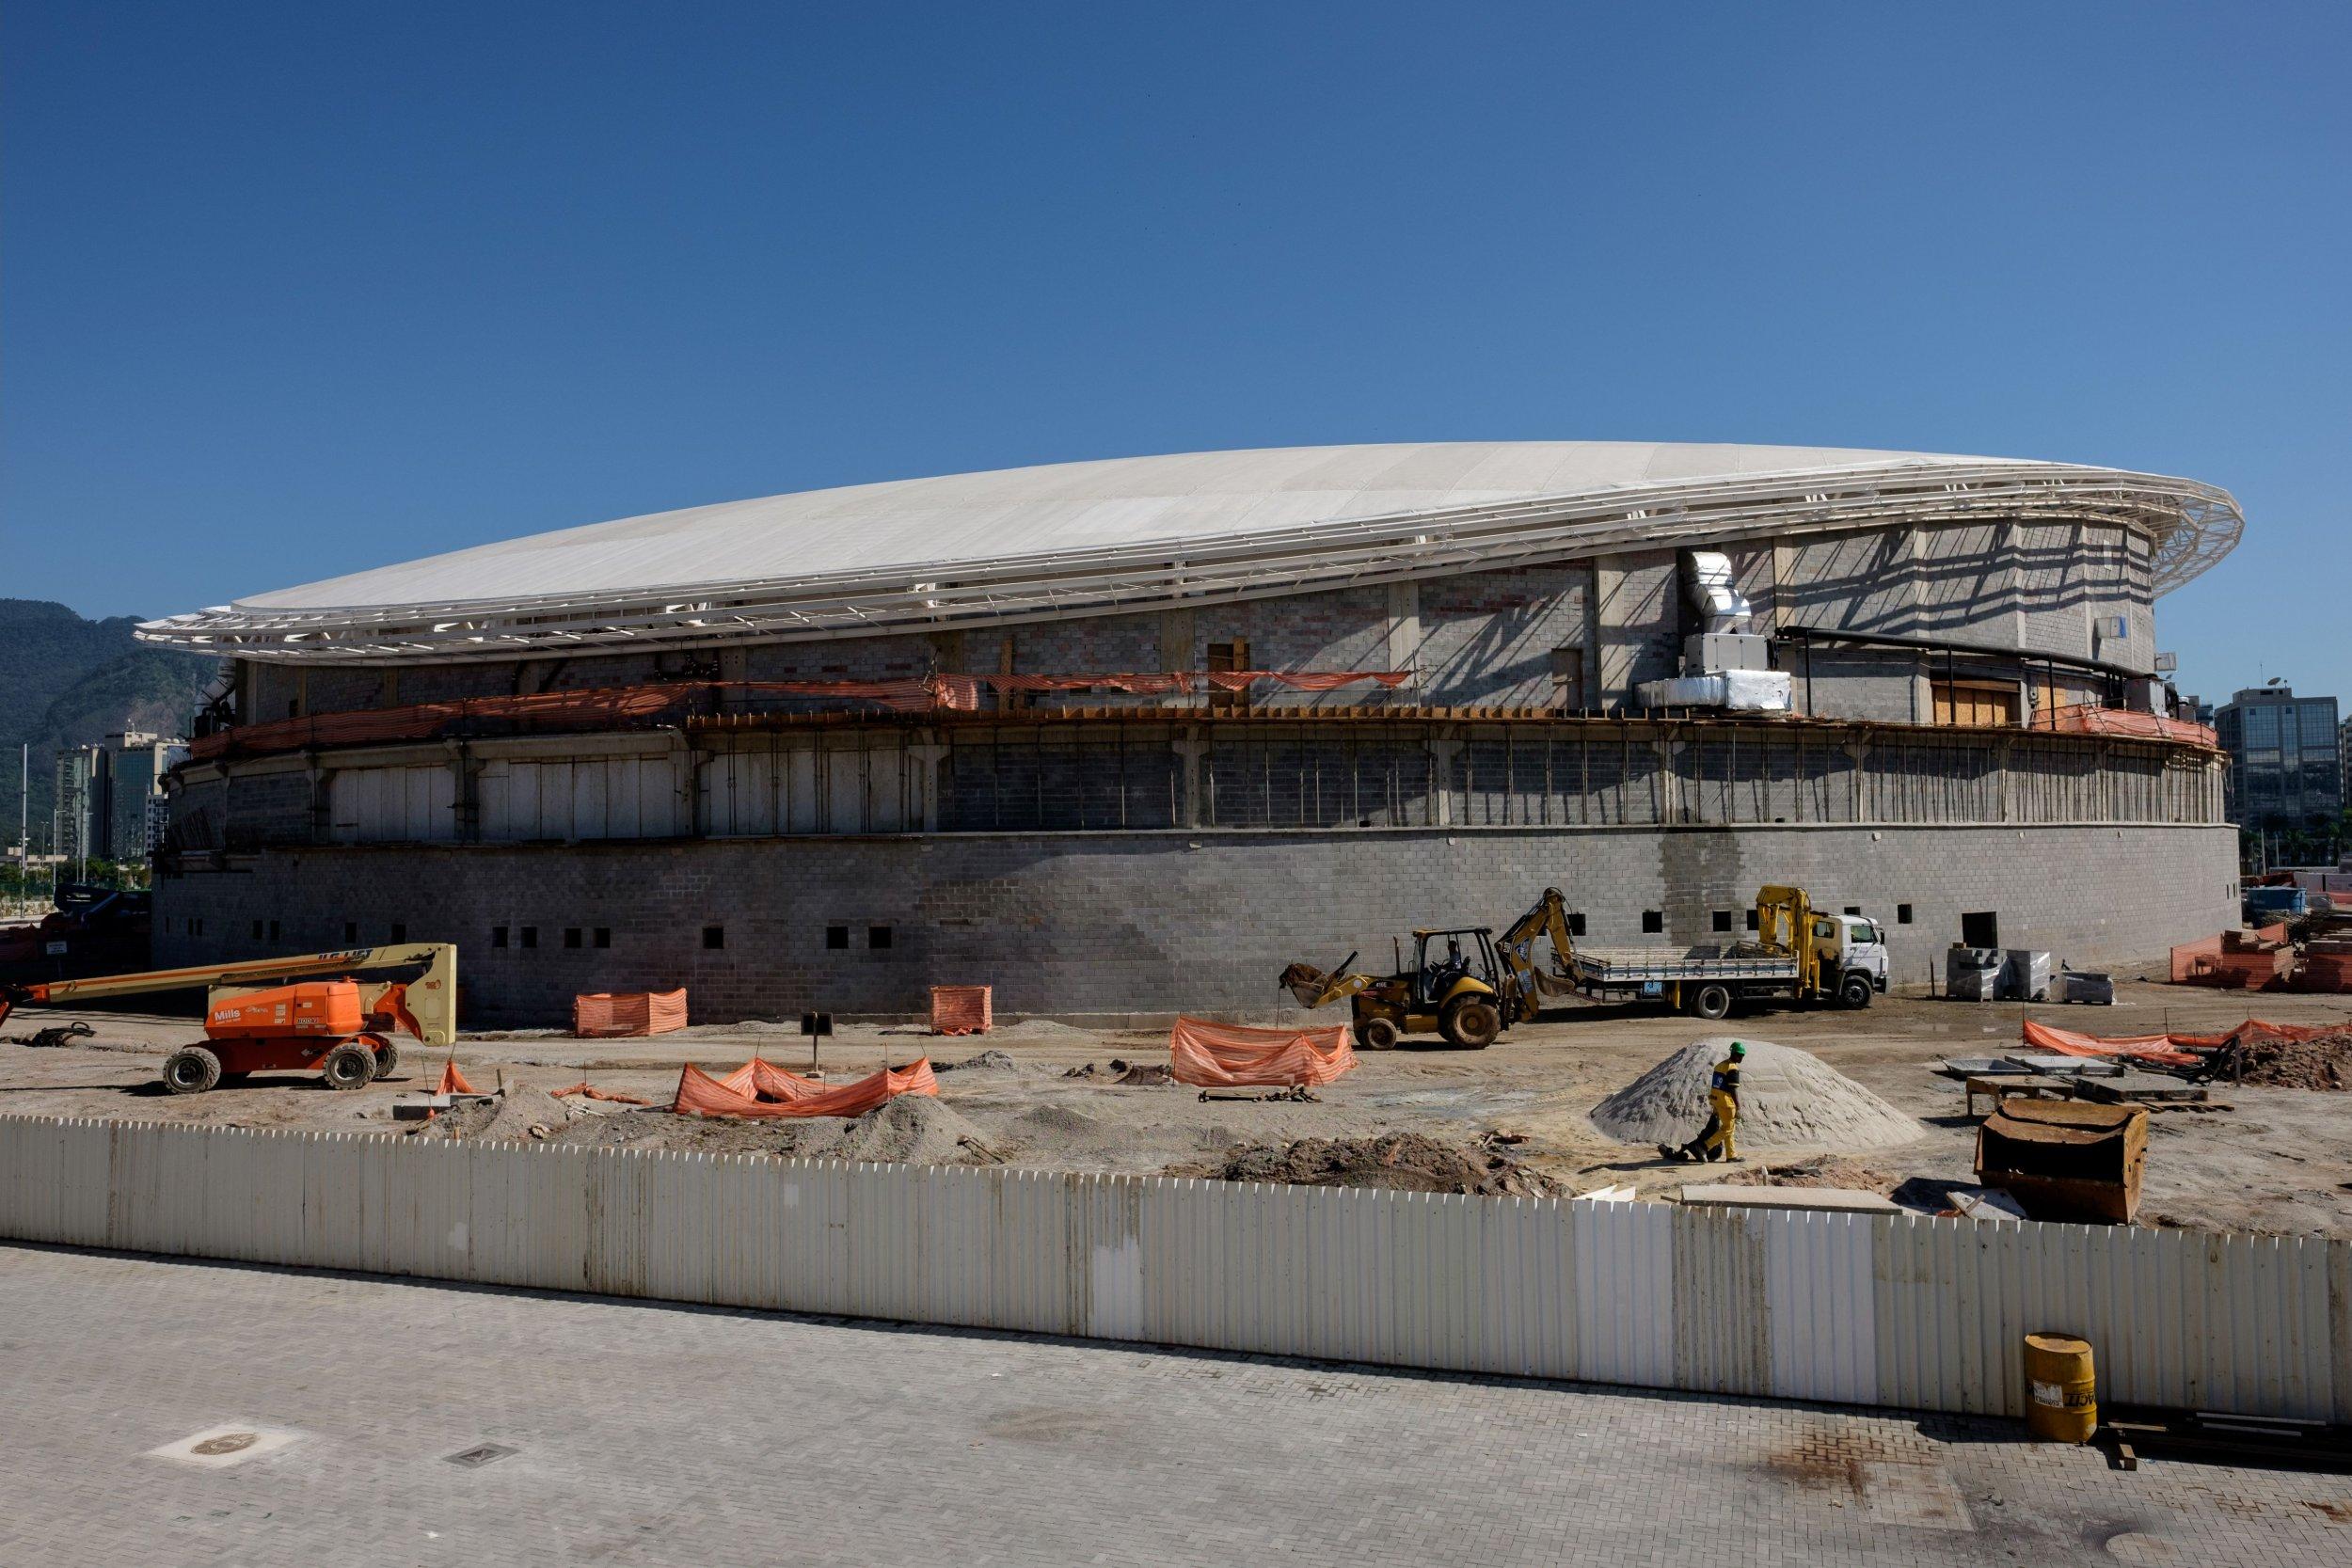 The Olympic velodrome in Rio de Janeiro.